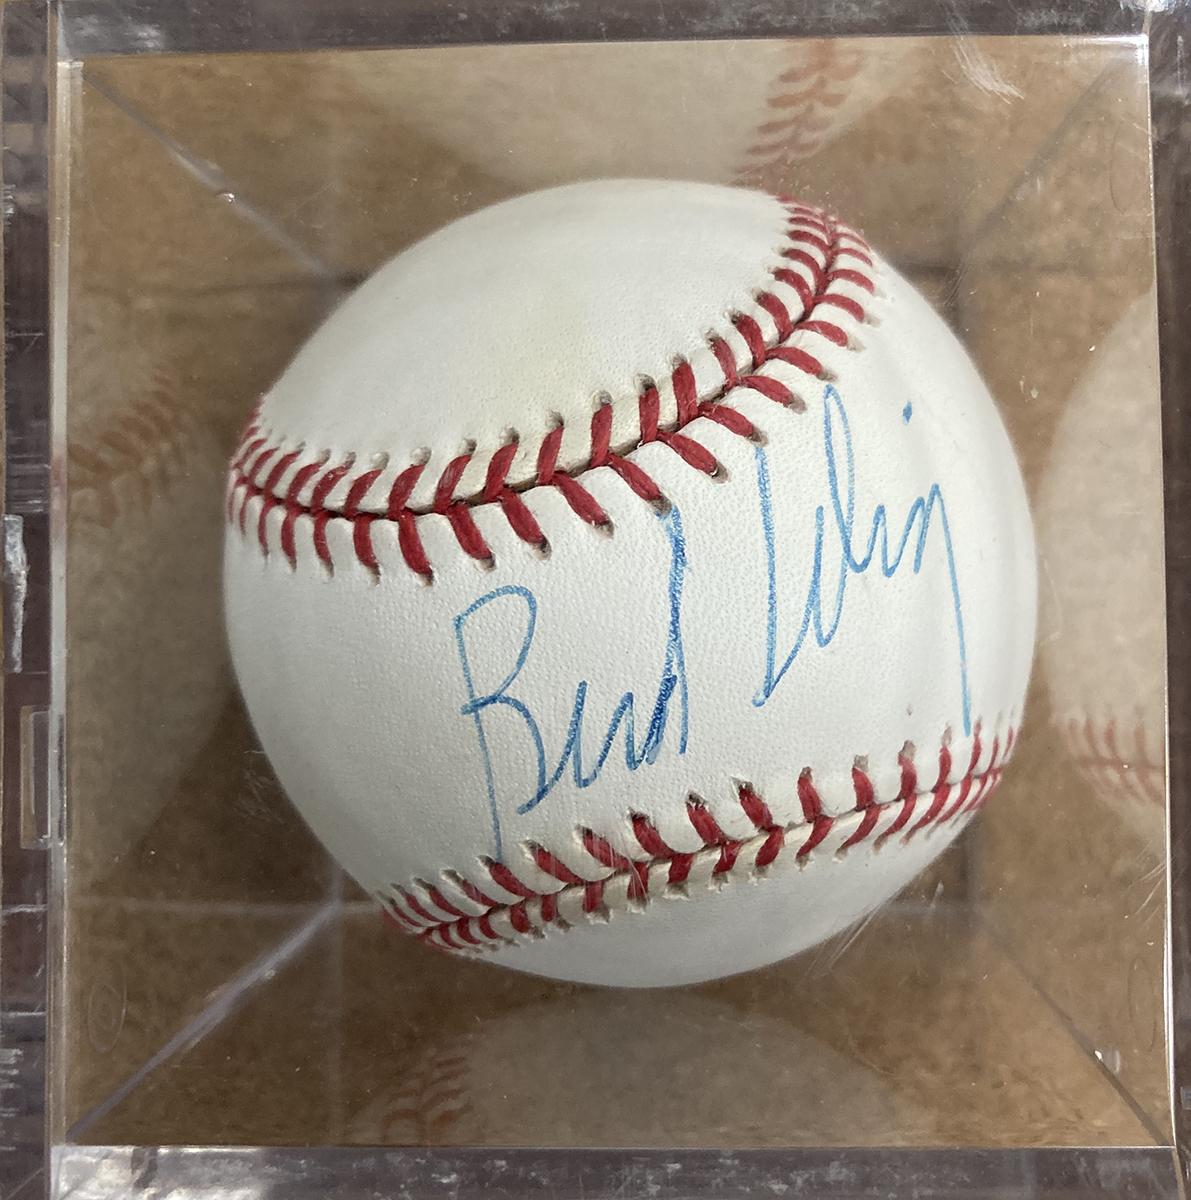 Bud Selig Autographed Baseball